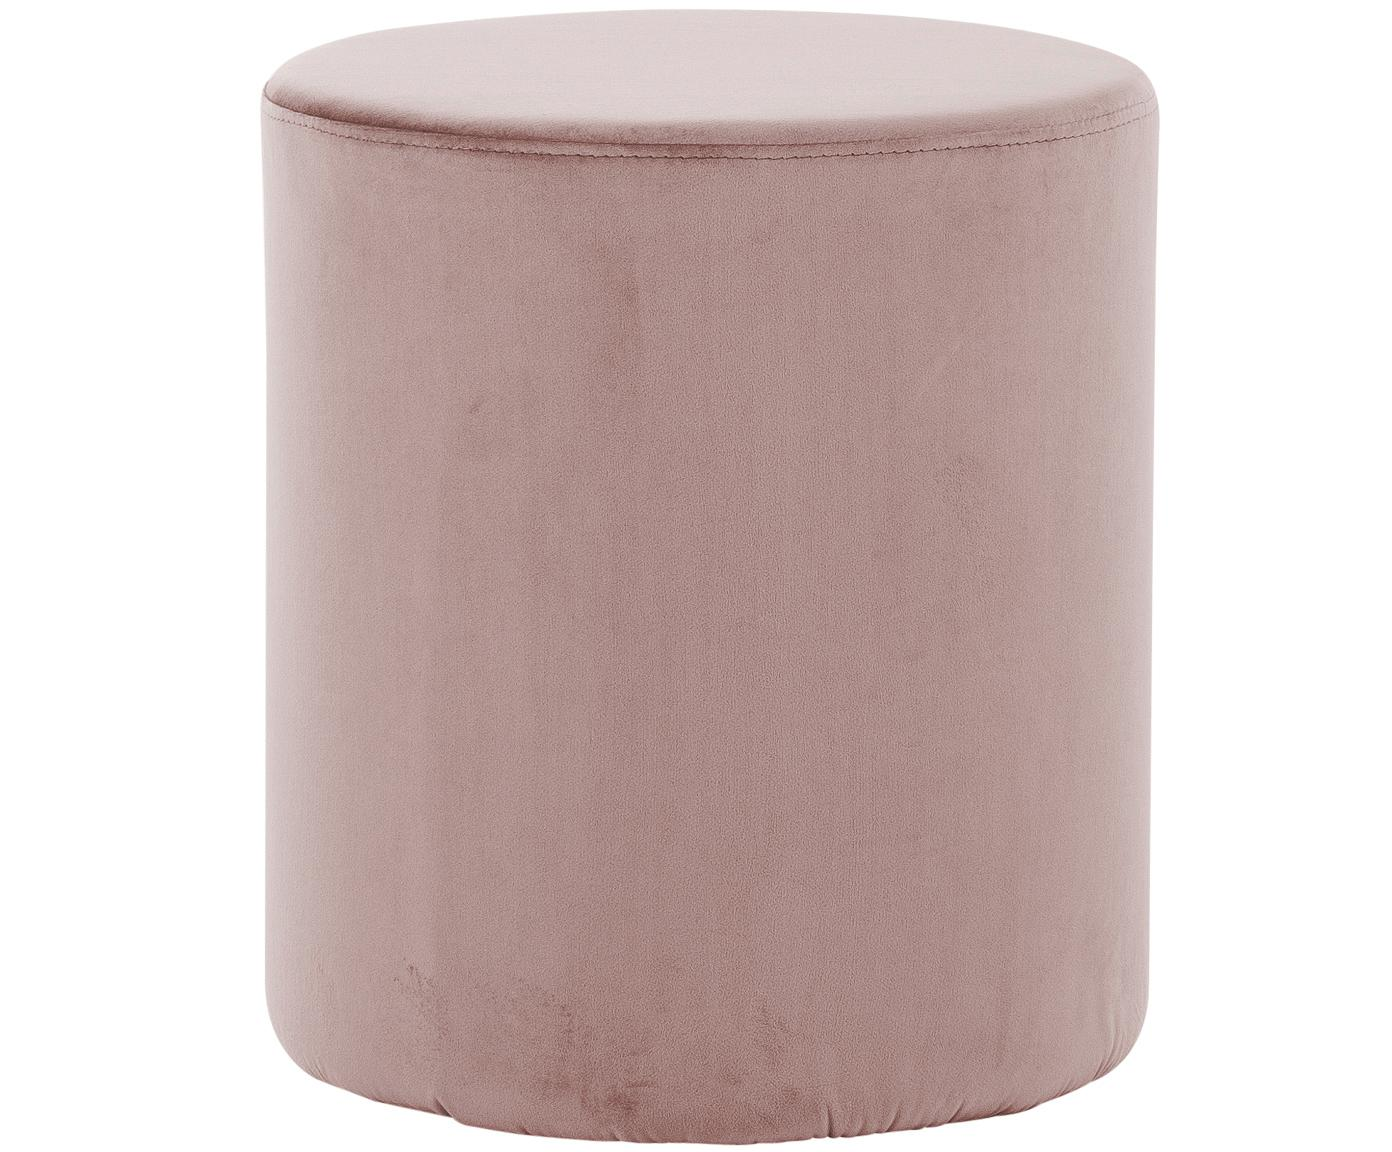 Samt-Hocker Daisy, Bezug: Samt (Polyester) 15.000 S, Rahmen: Mitteldichte Holzfaserpla, Rosa, Ø 38 x H 46 cm